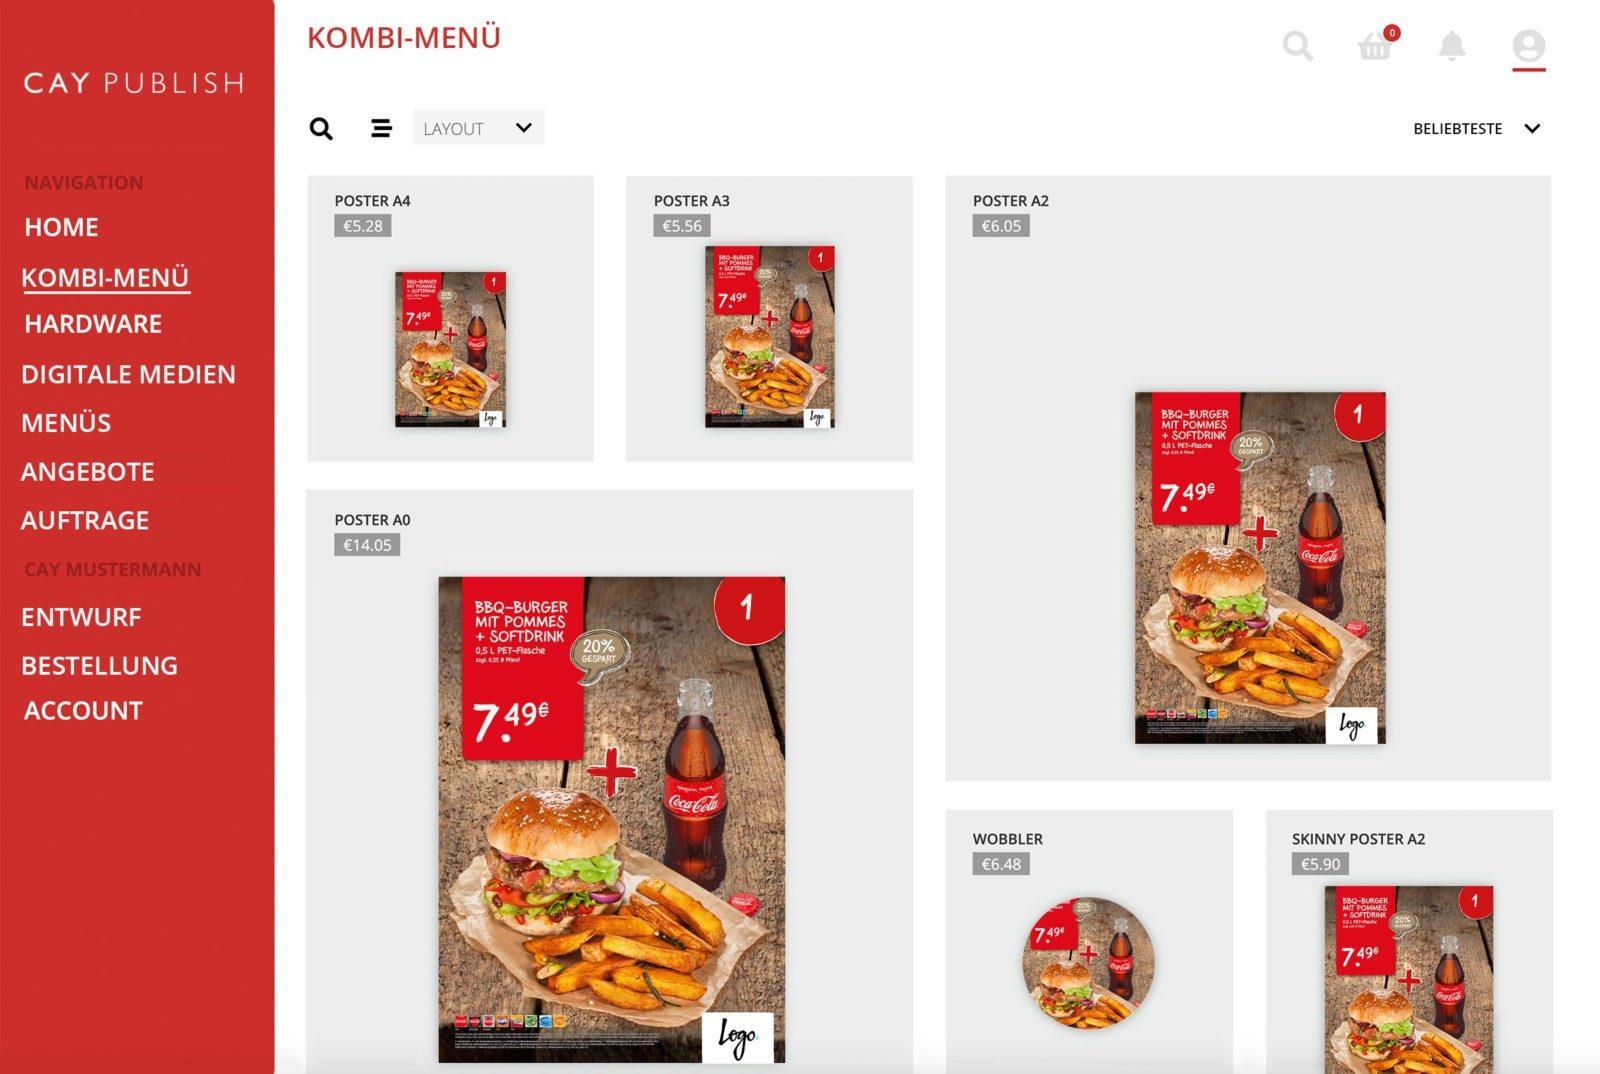 Kombi-Menüs mit CAY PUBLISH